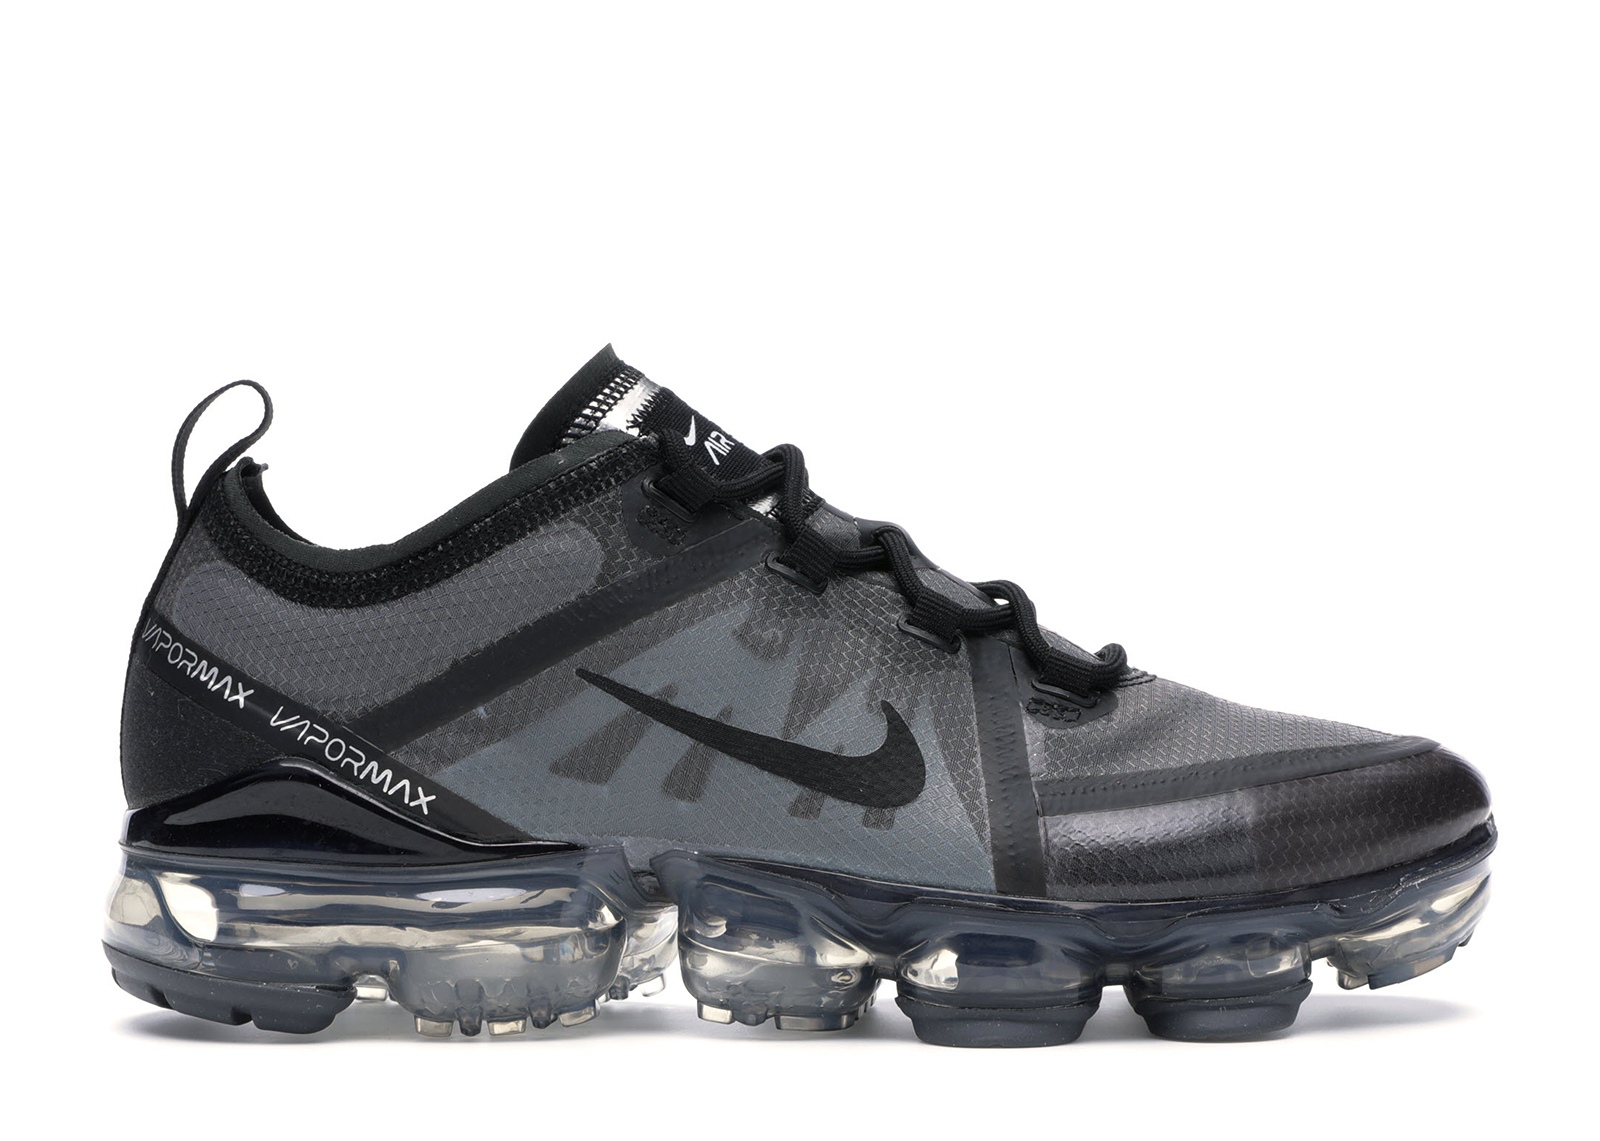 Nike Air VaporMax 2019 Triple Black (GS) - AJ2616-001